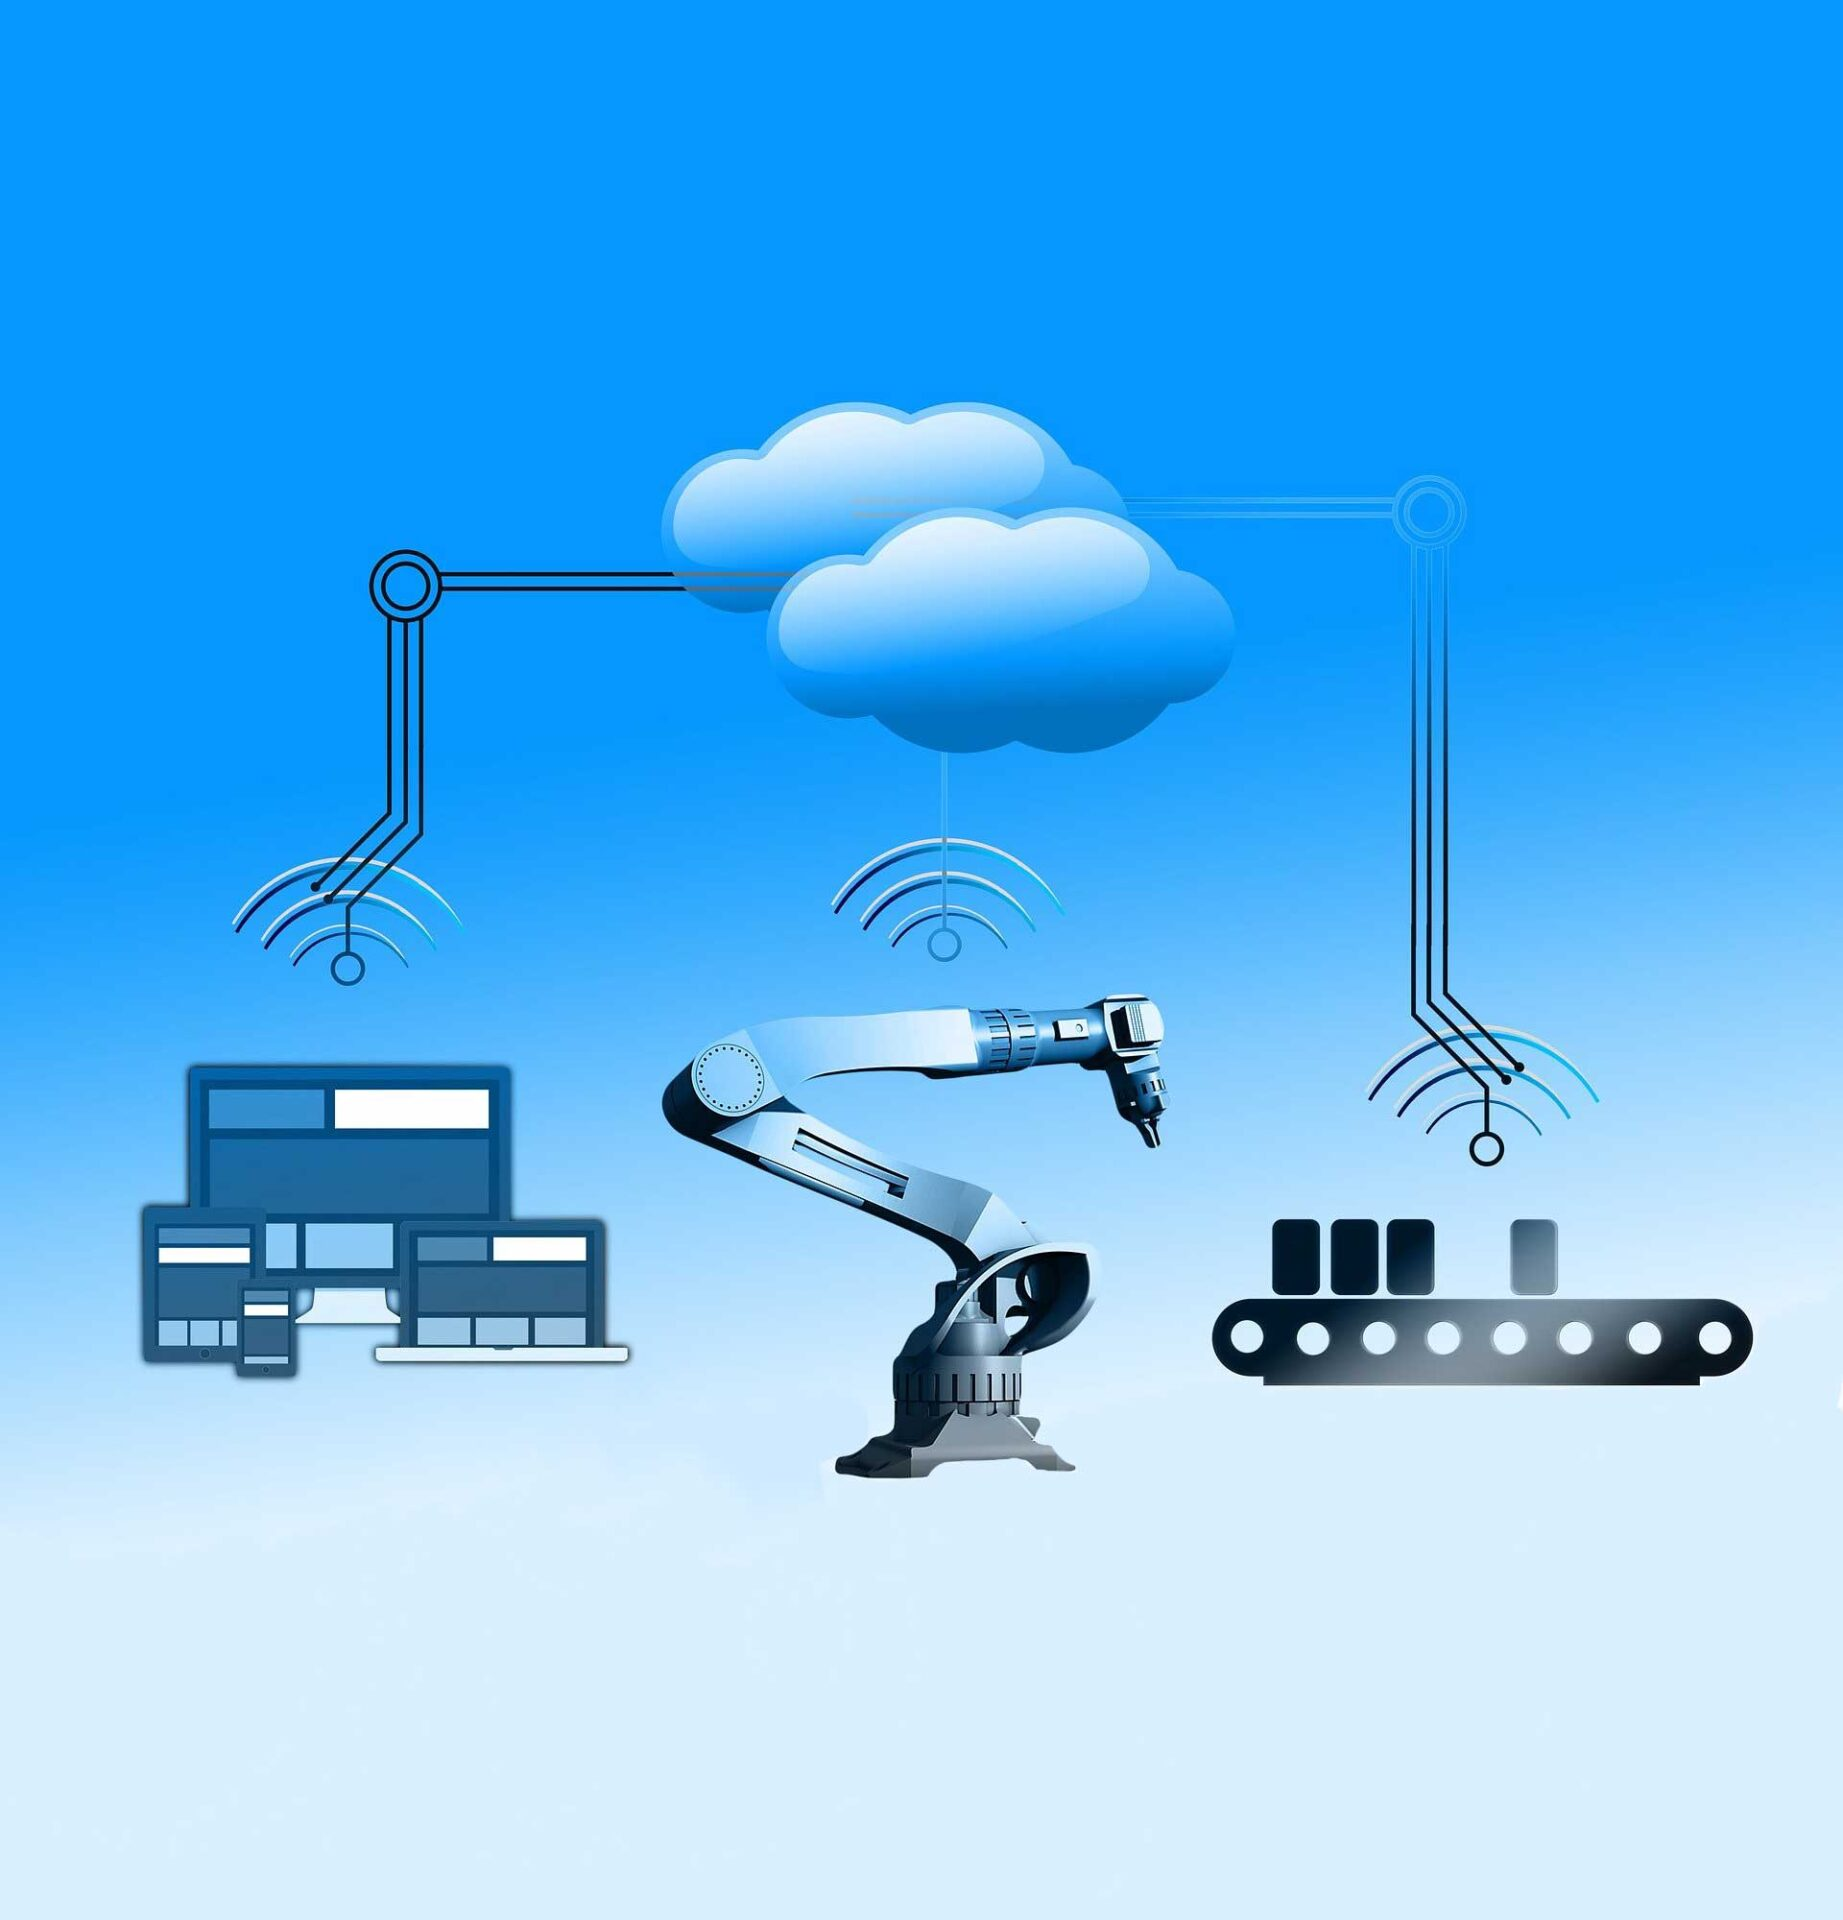 https://www.ccifrance-allemagne.fr/wp-content/uploads/2021/02/electronique_IoT_robot-scaled.jpg